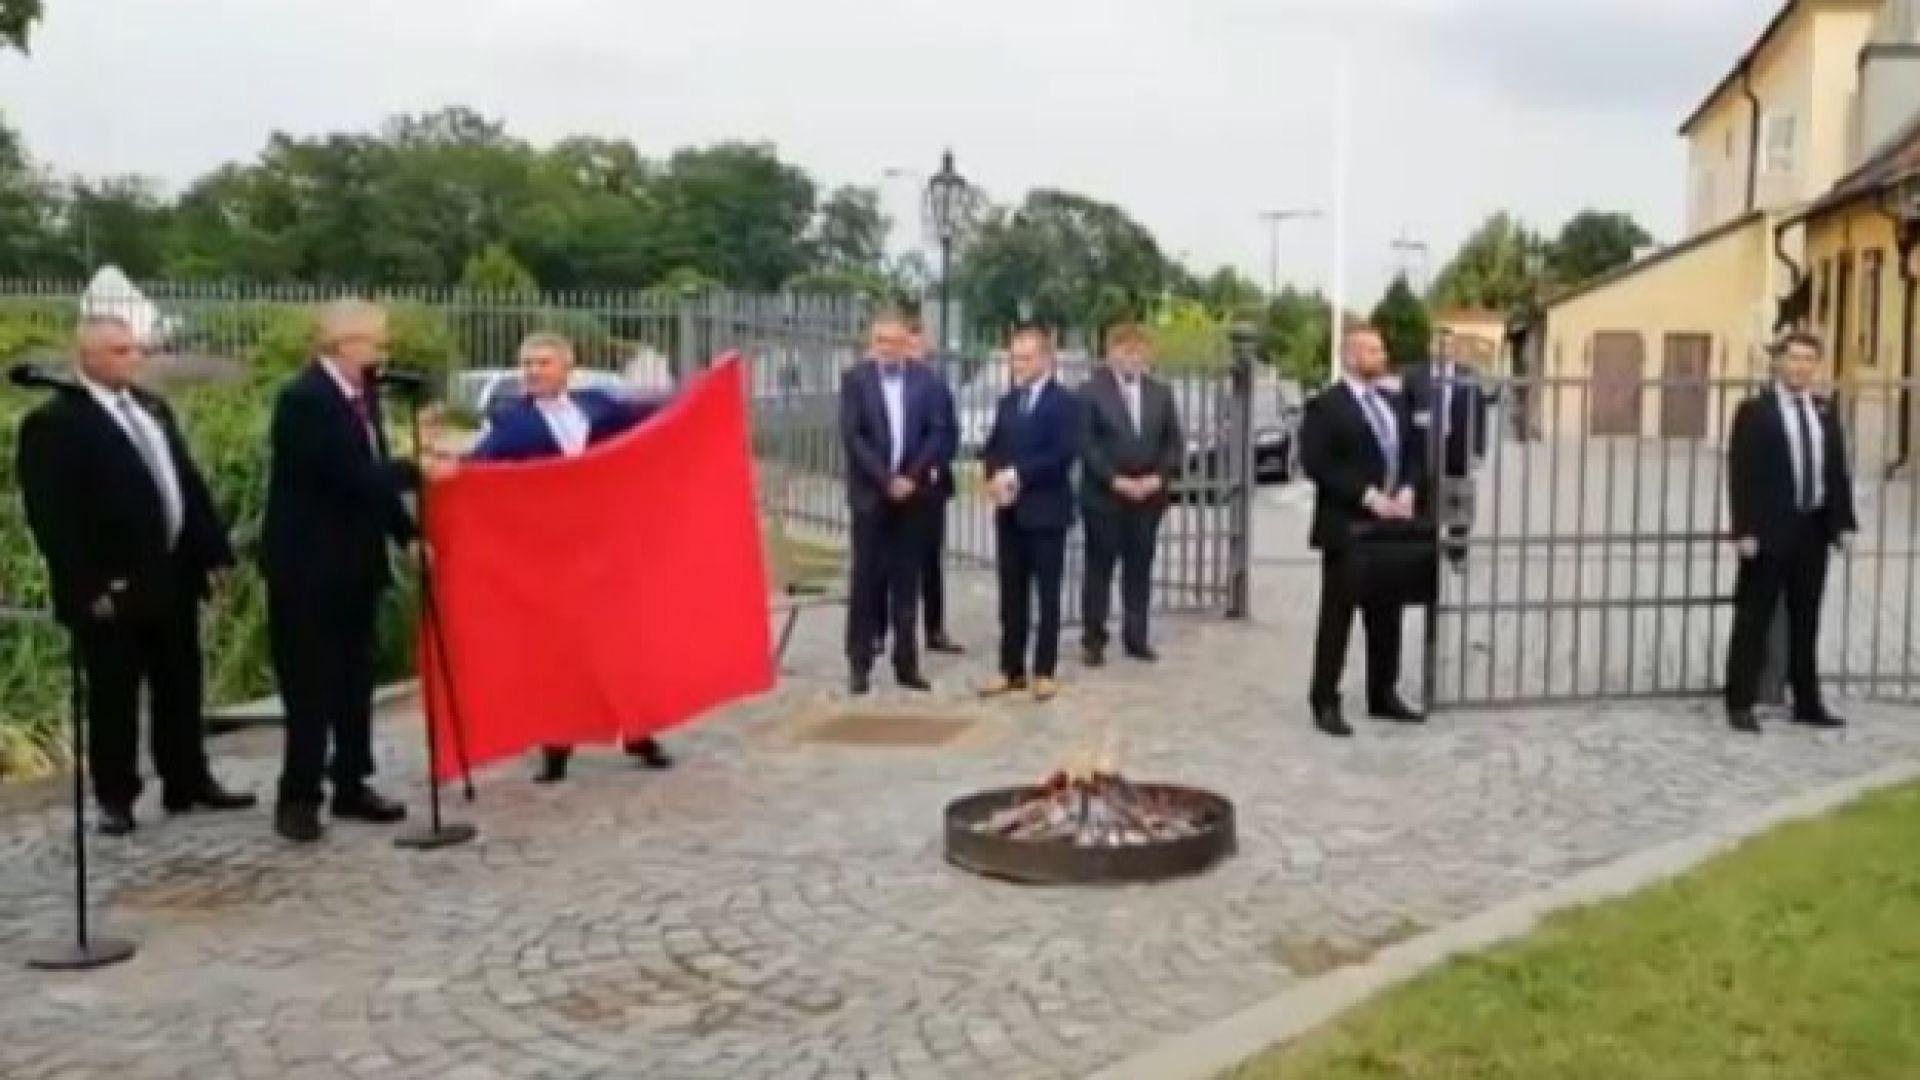 Земан запали пред журналисти гигантски червени гащи (видео)